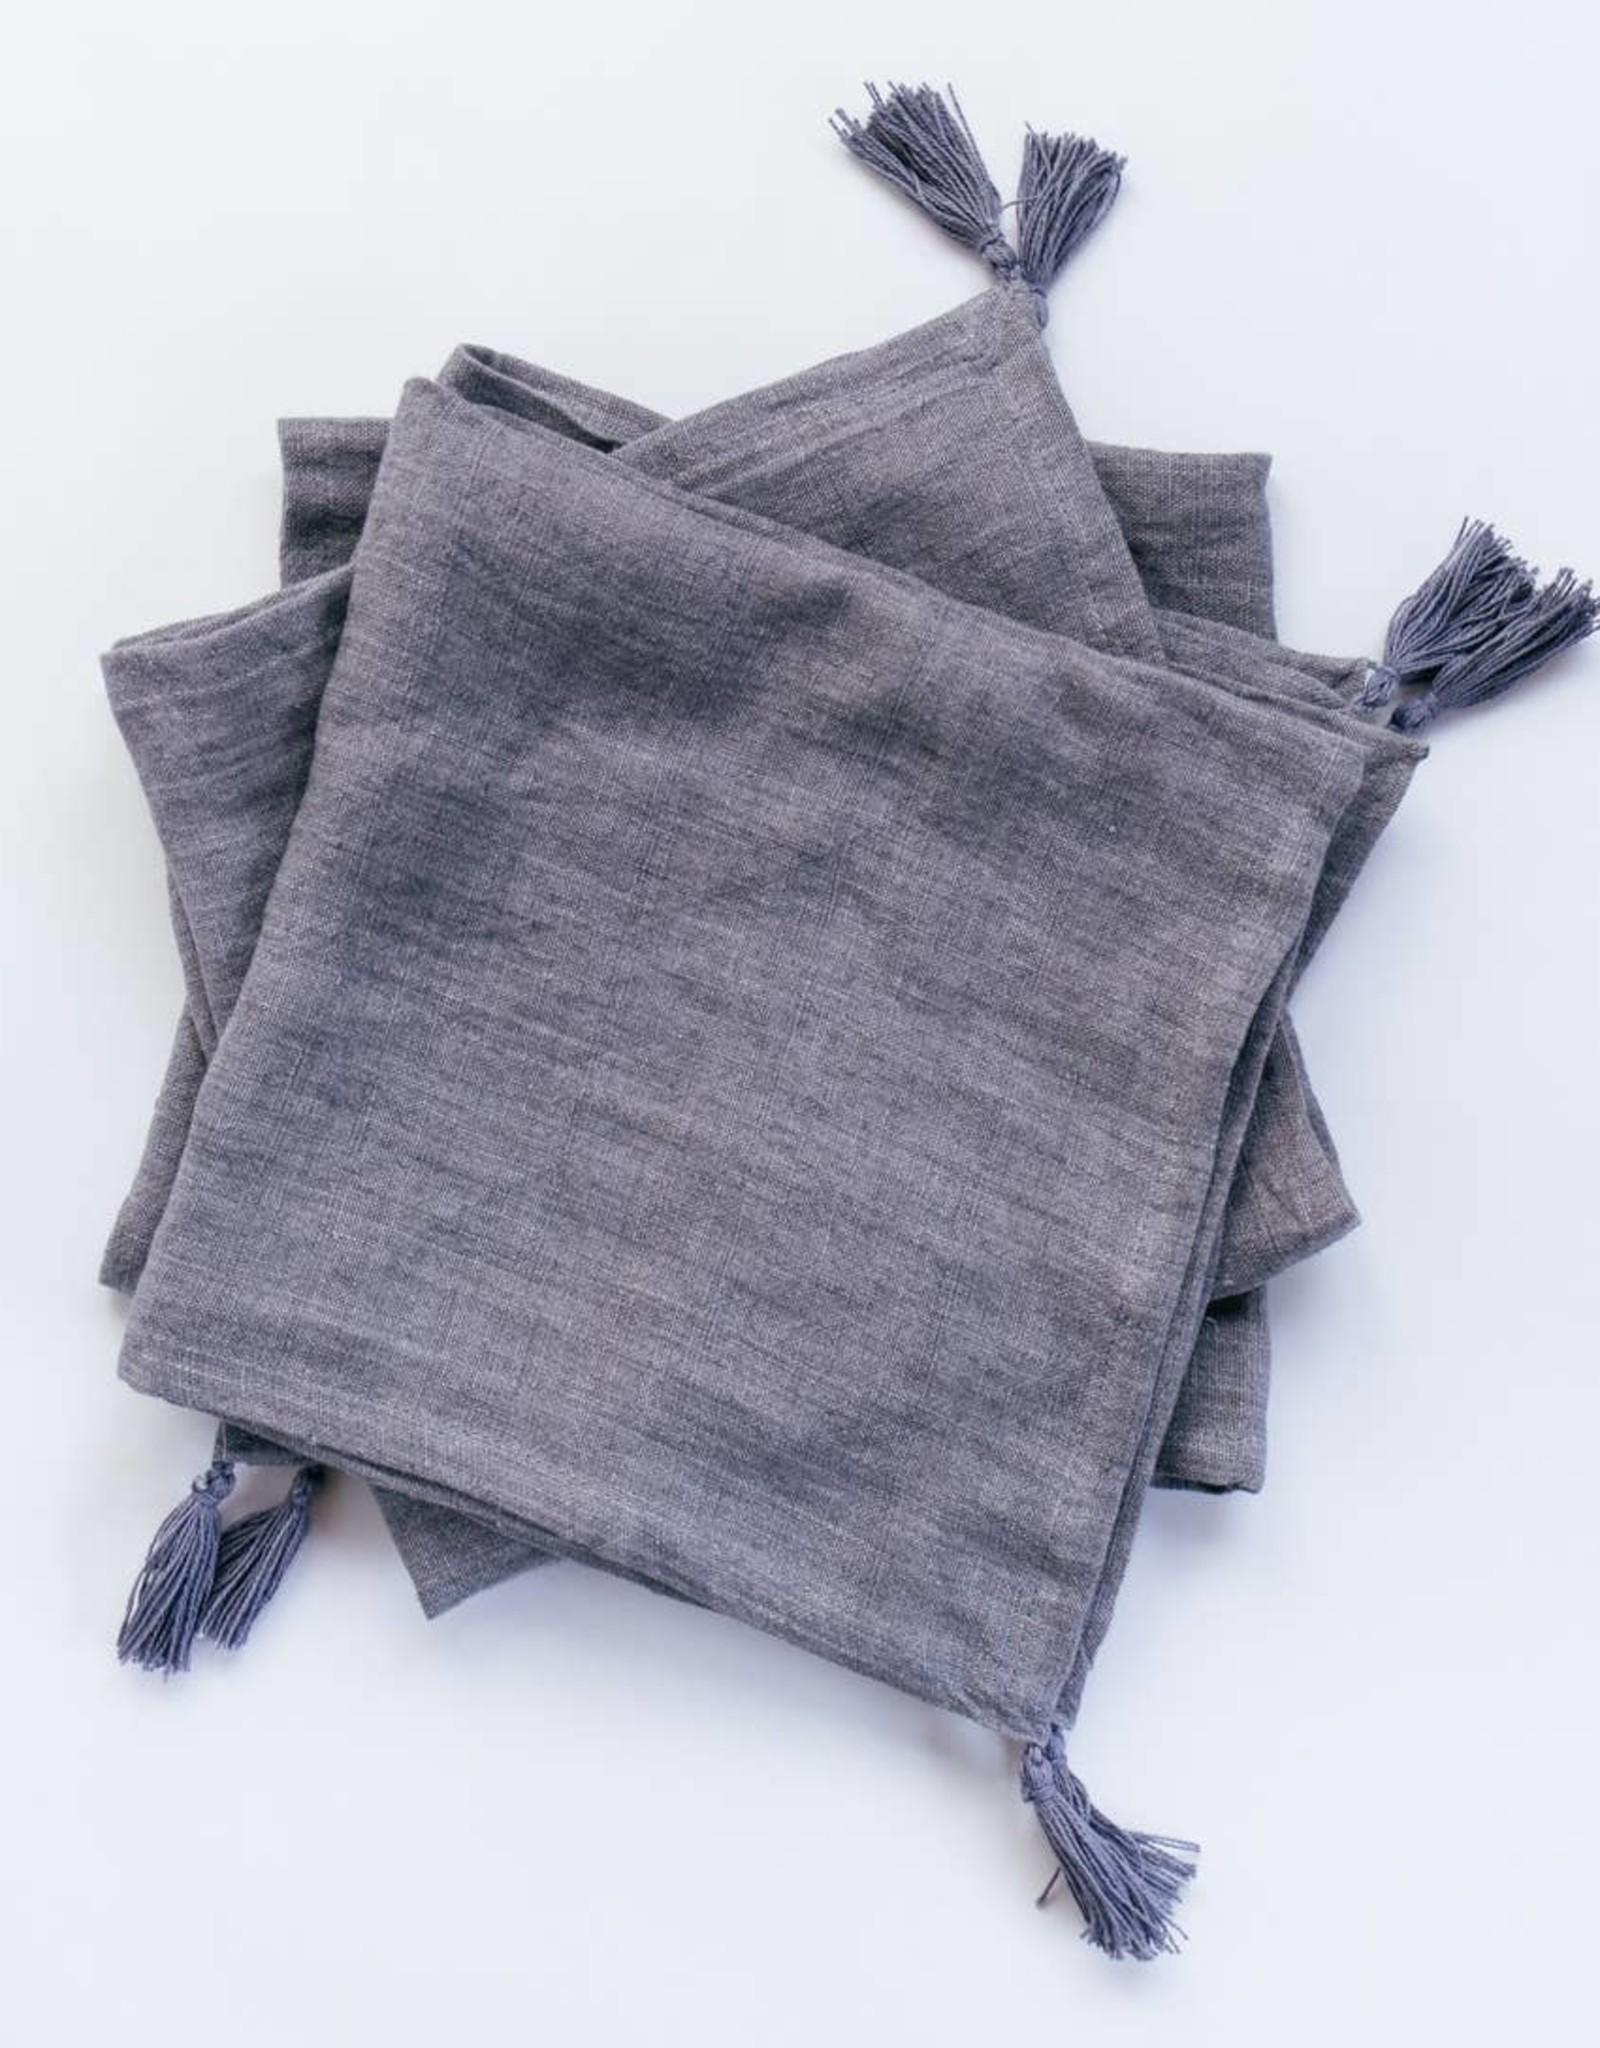 Creative Women Stone Washed Linen Tasseled Napkin